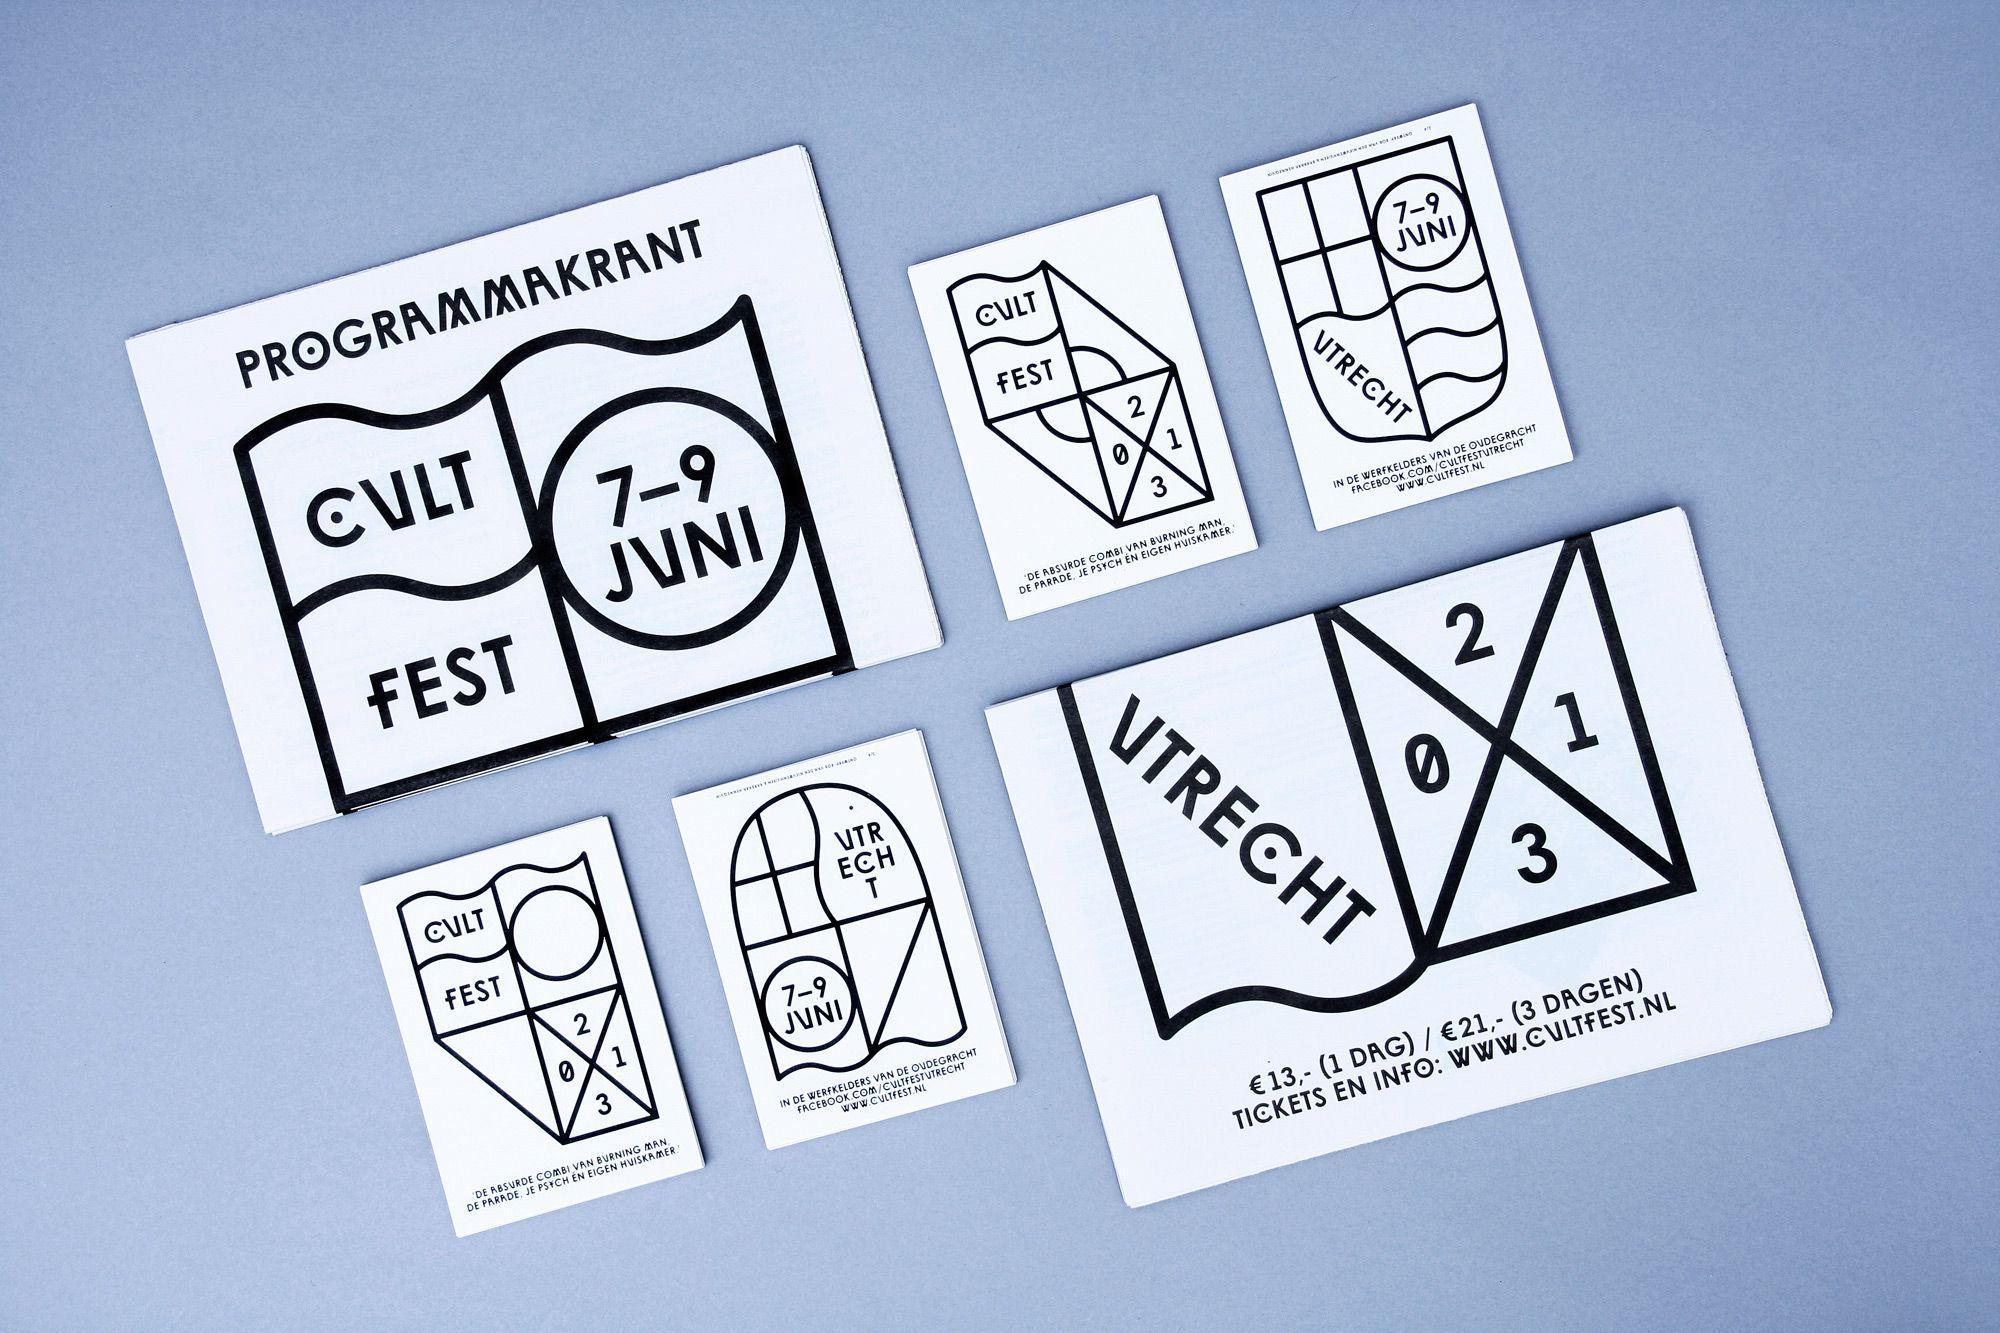 Cultfest / Barbara Hennequin (5)